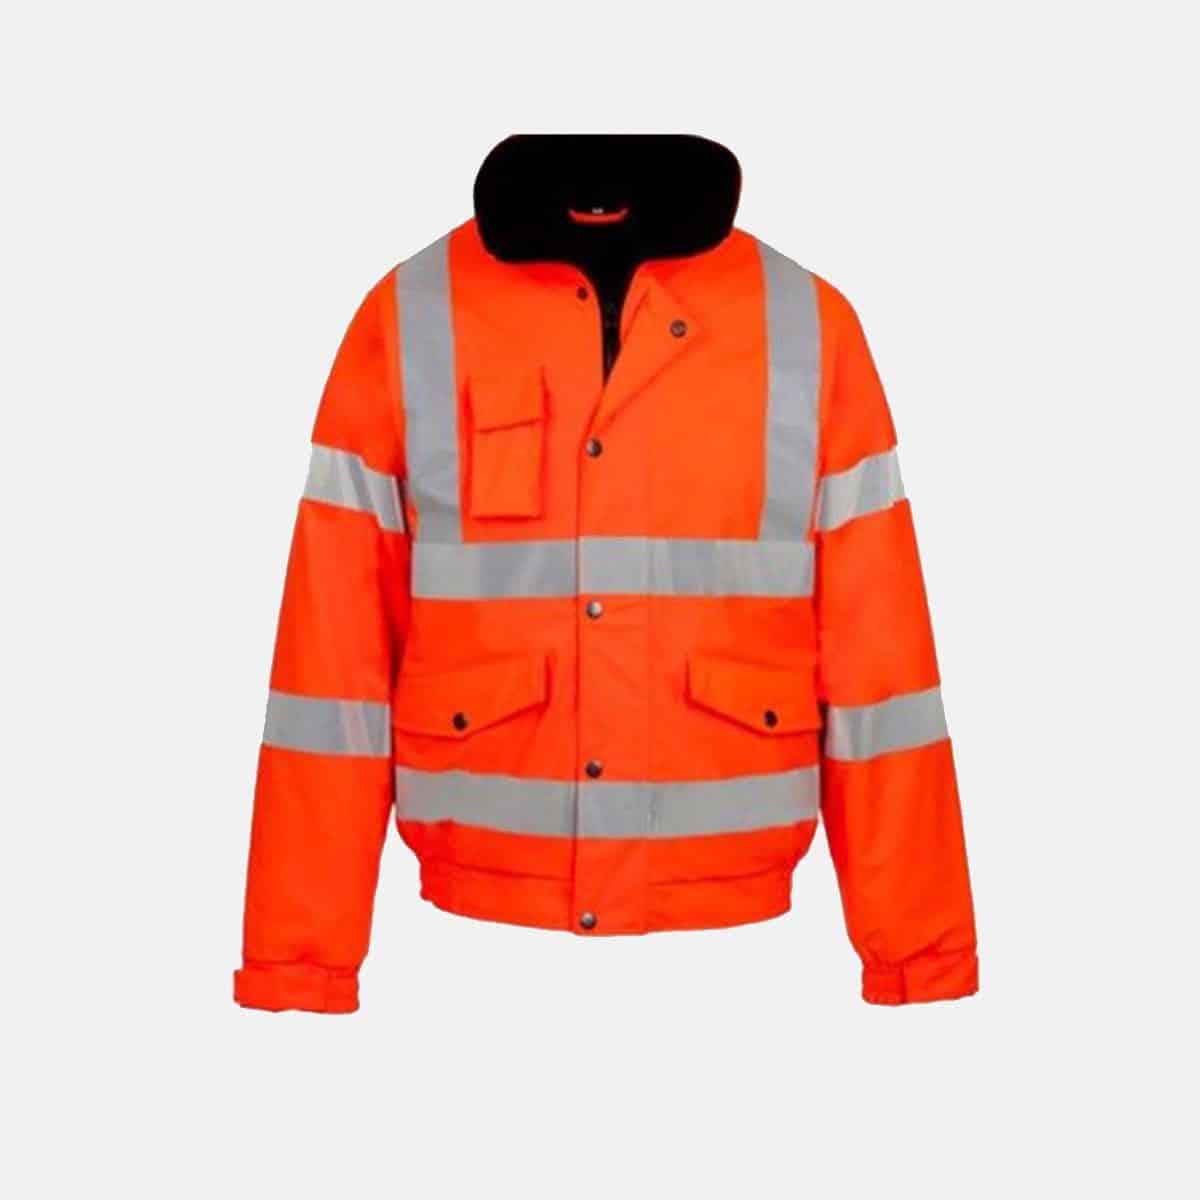 High Visibility Bomber Jacket In Orange